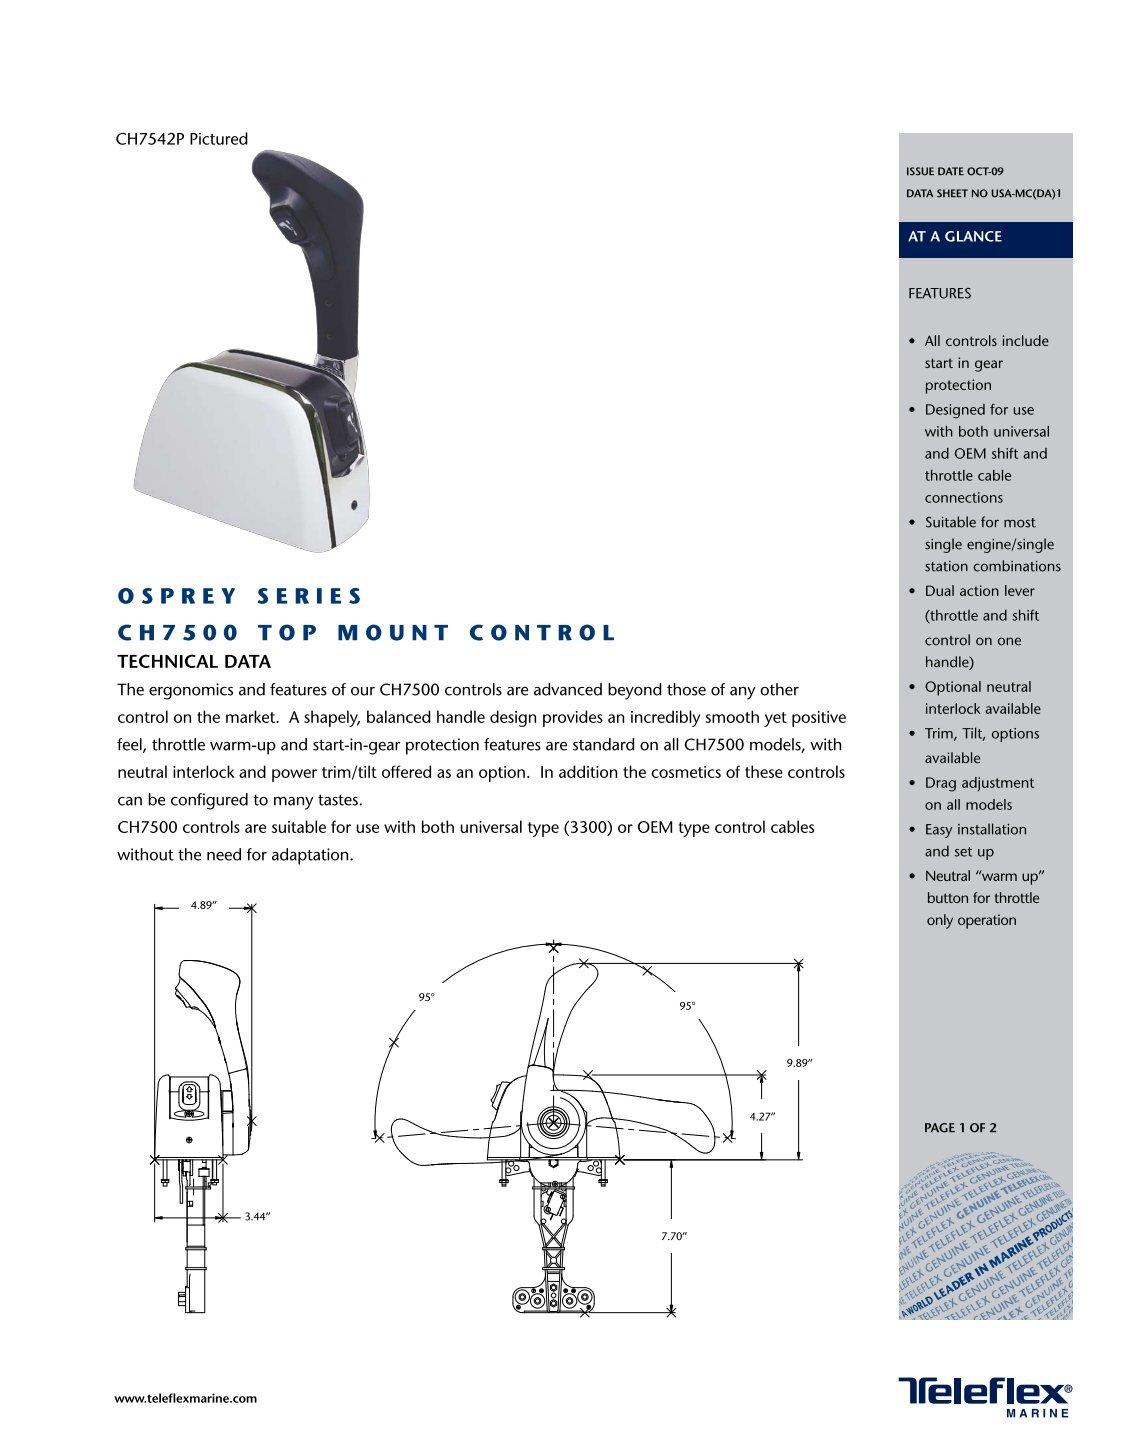 70 Free Magazines From Go2marinecom Osprey Engine Diagram